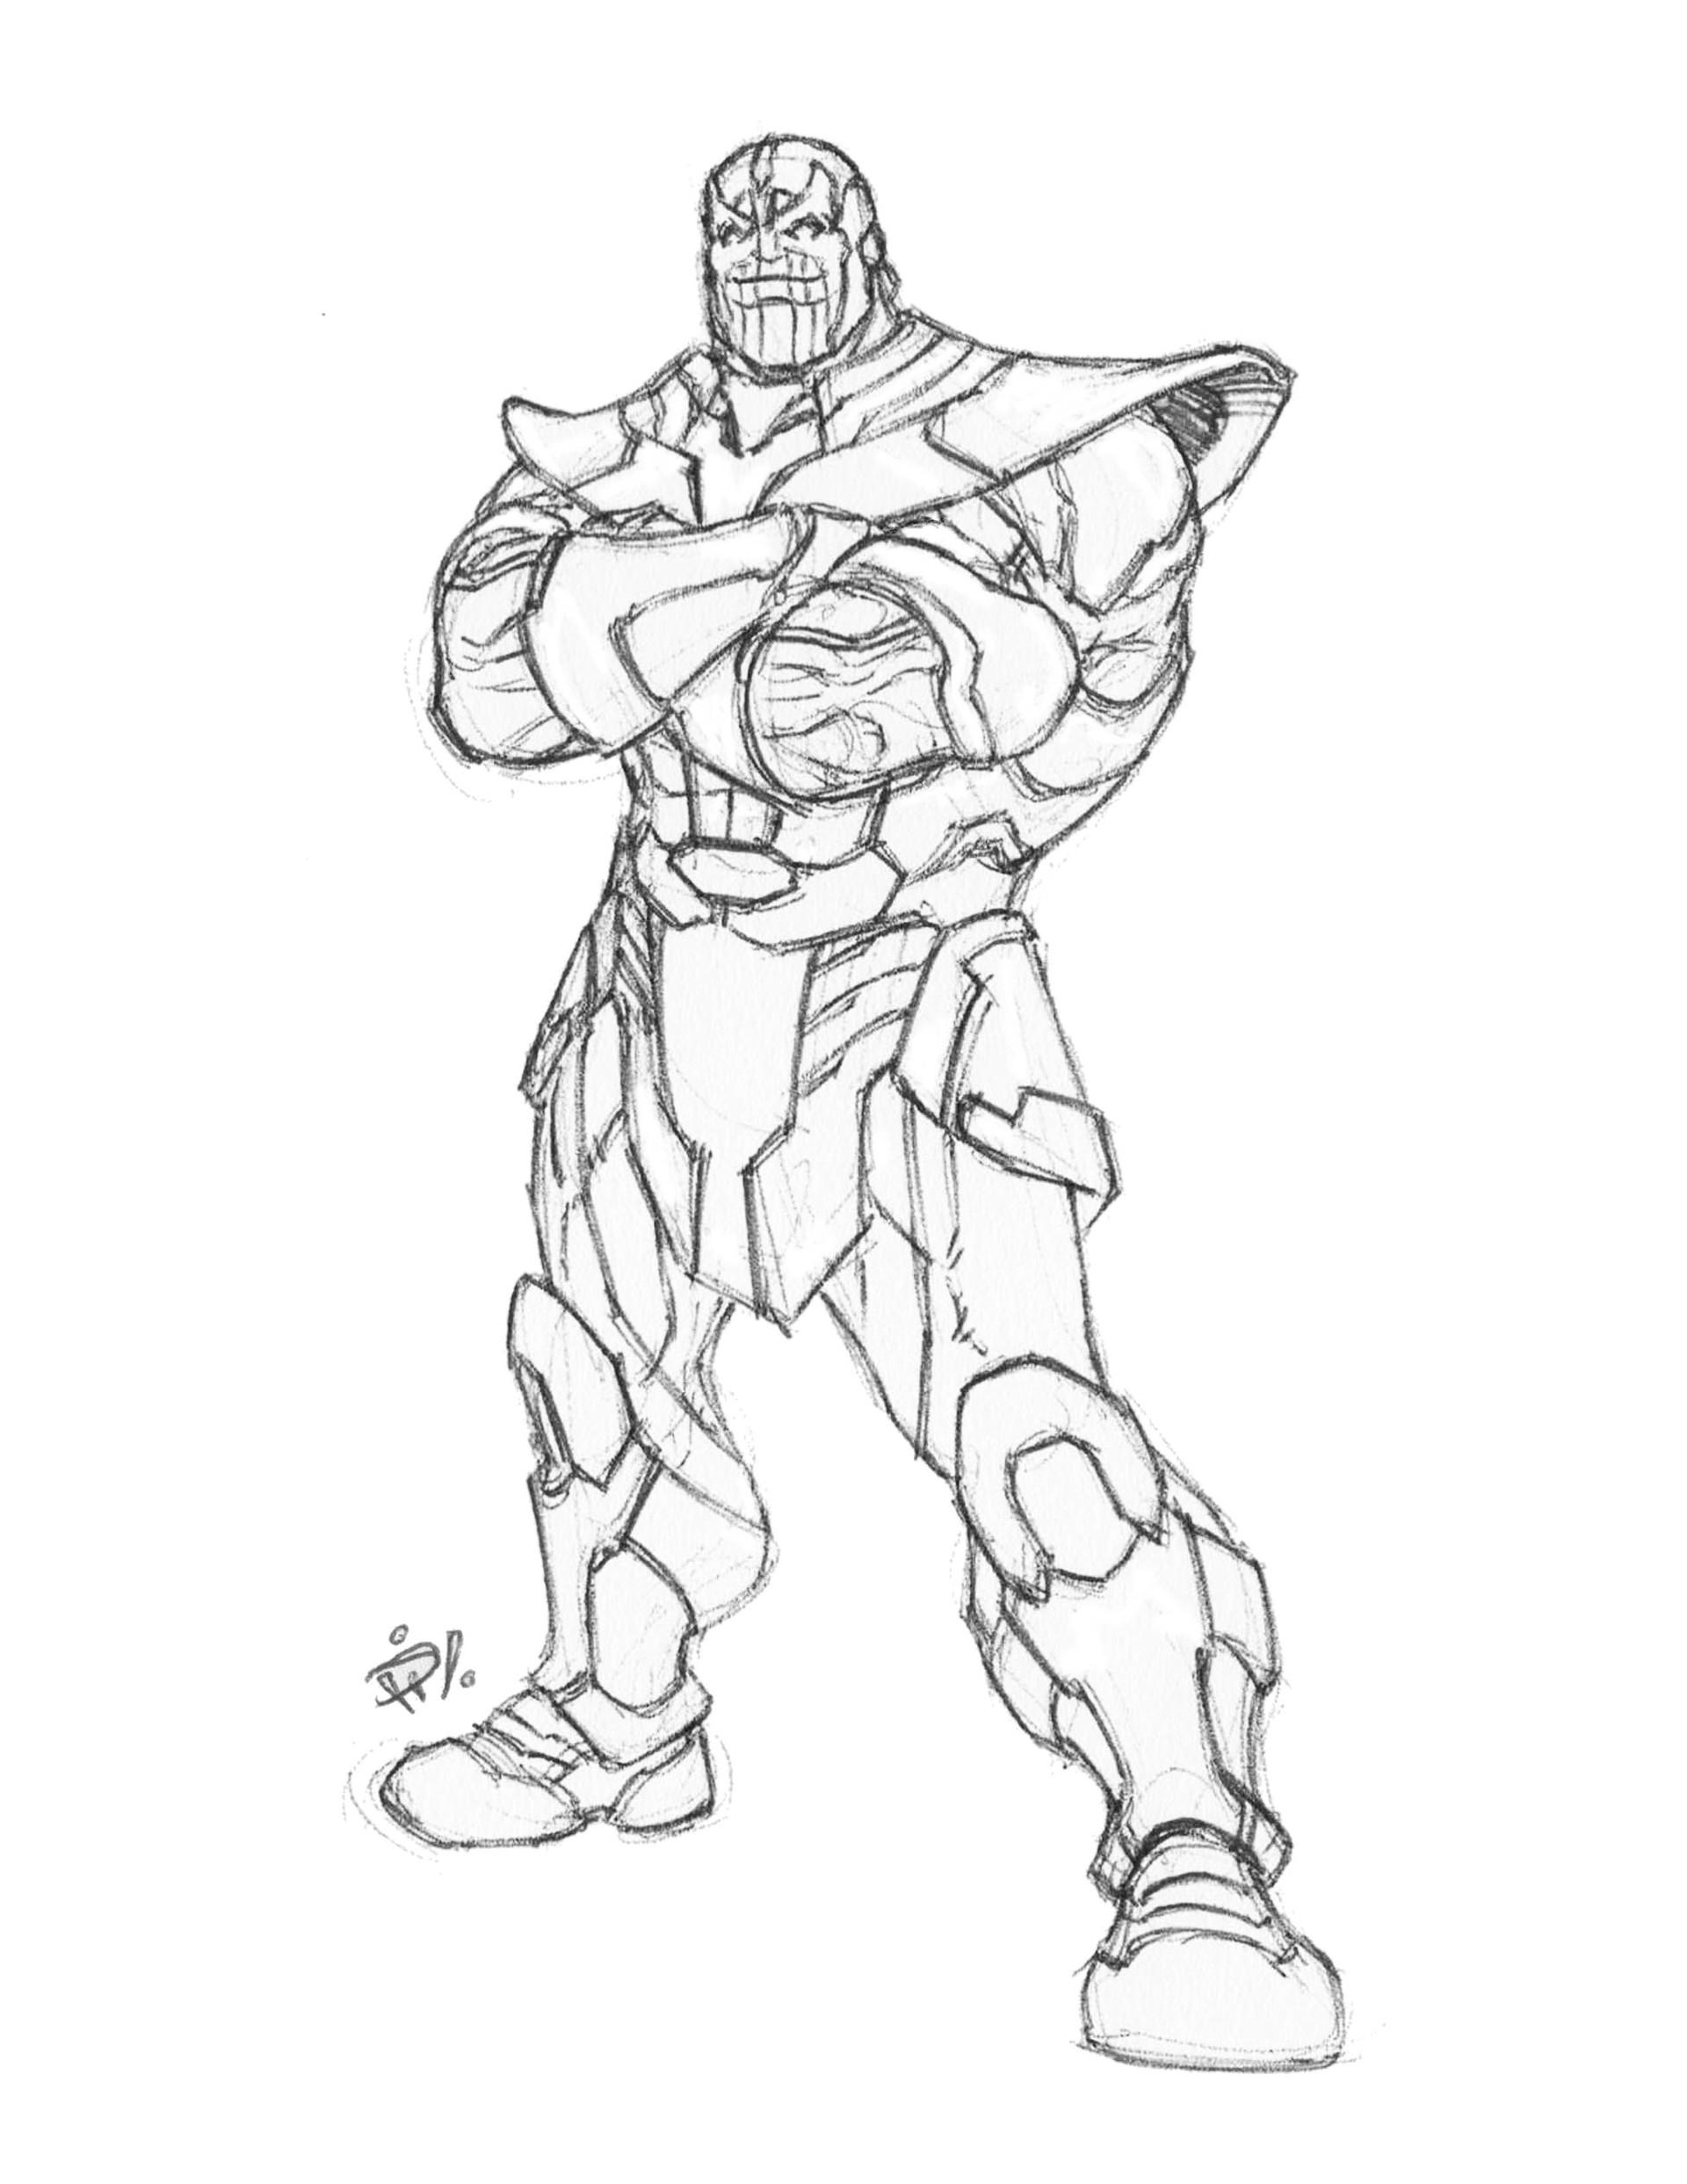 ArtStation - Thanos pensketch, Gerald Pilare